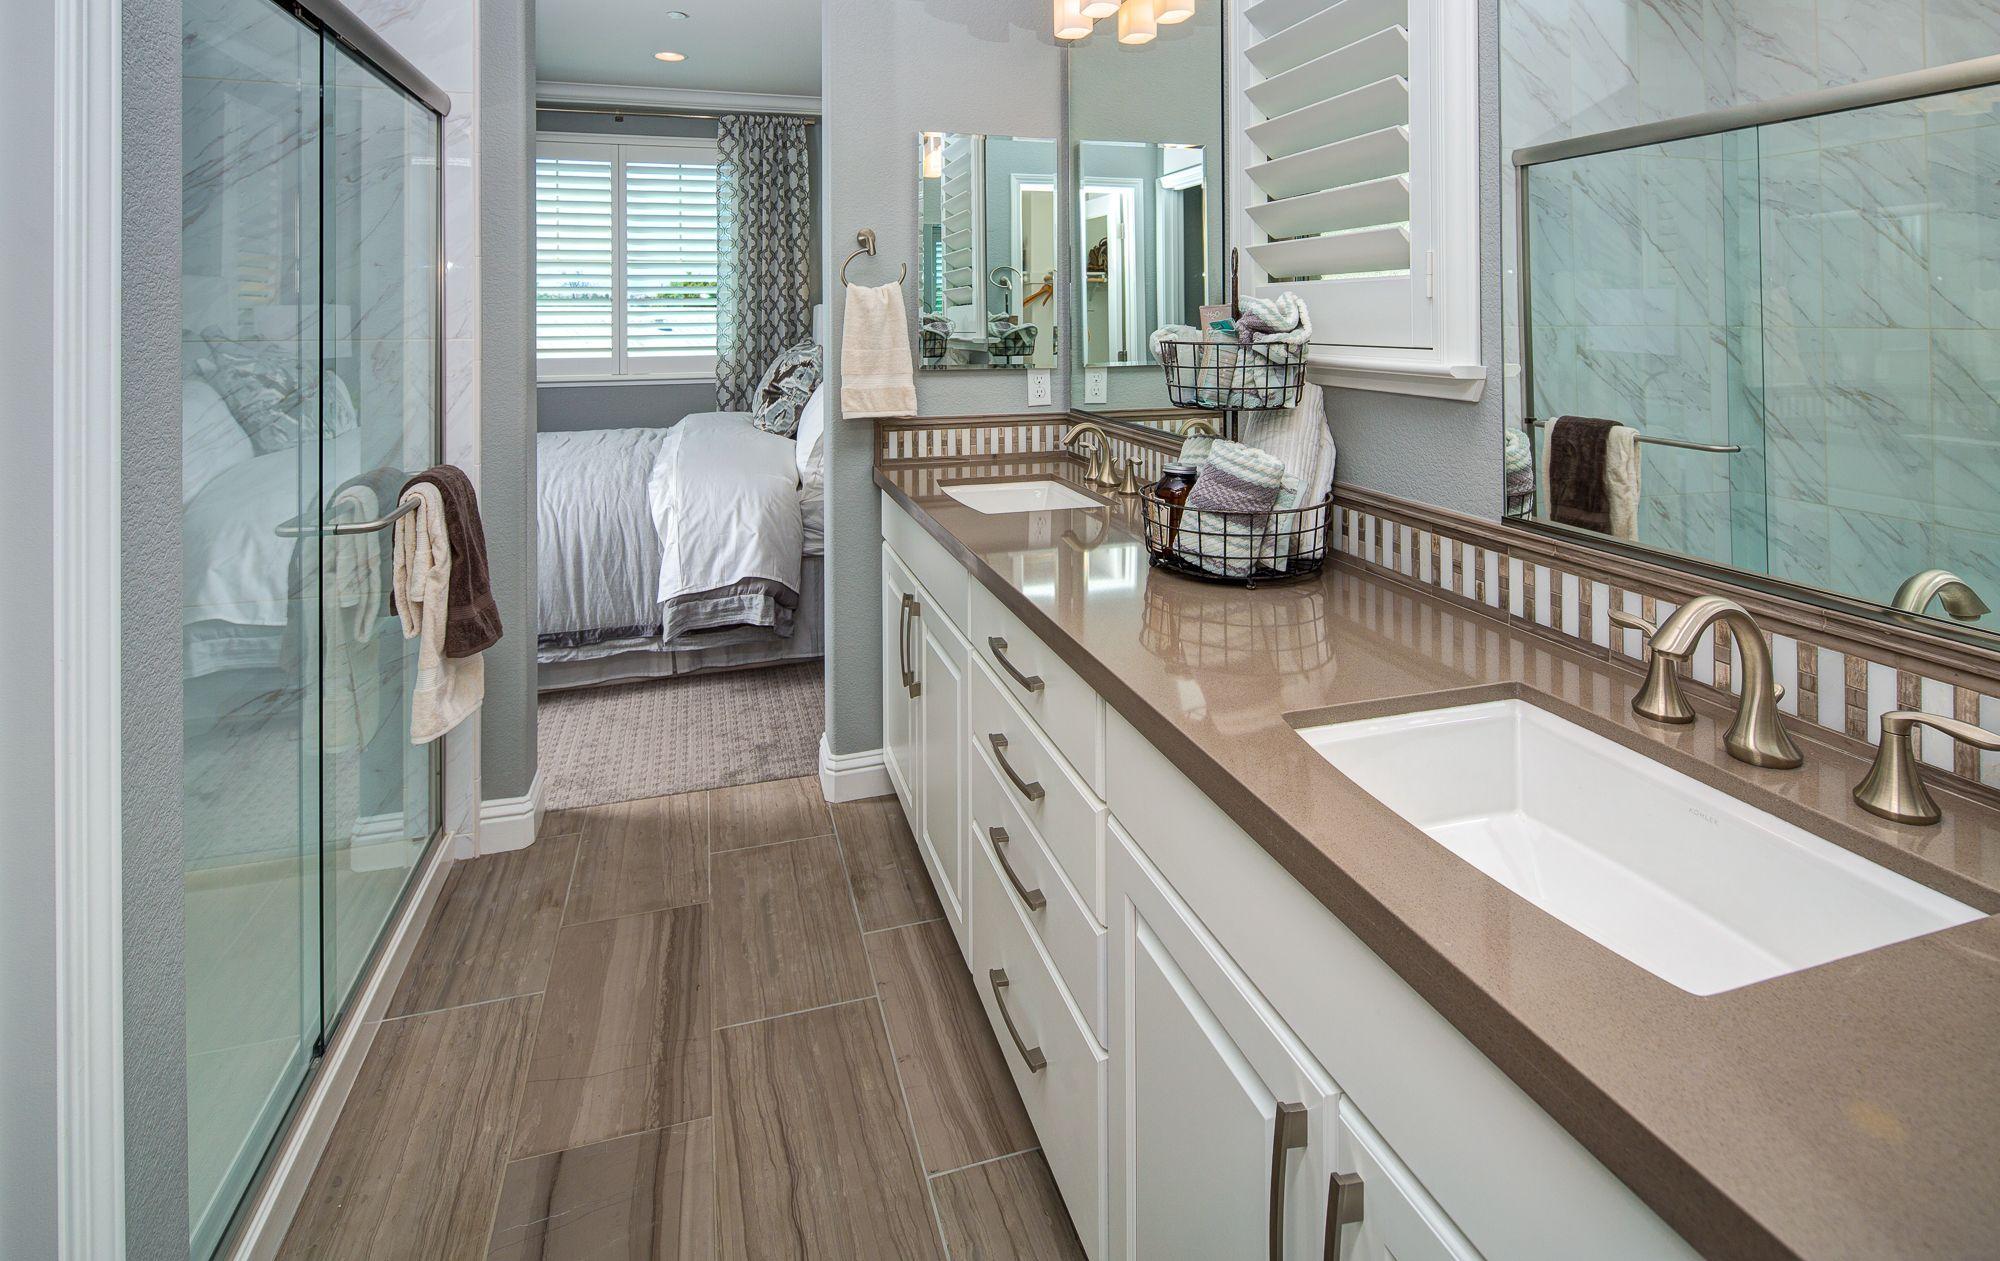 Master Bathroom L Plan B L Brighton By Taylor Morrison L Livermore - Bathroom remodel livermore ca